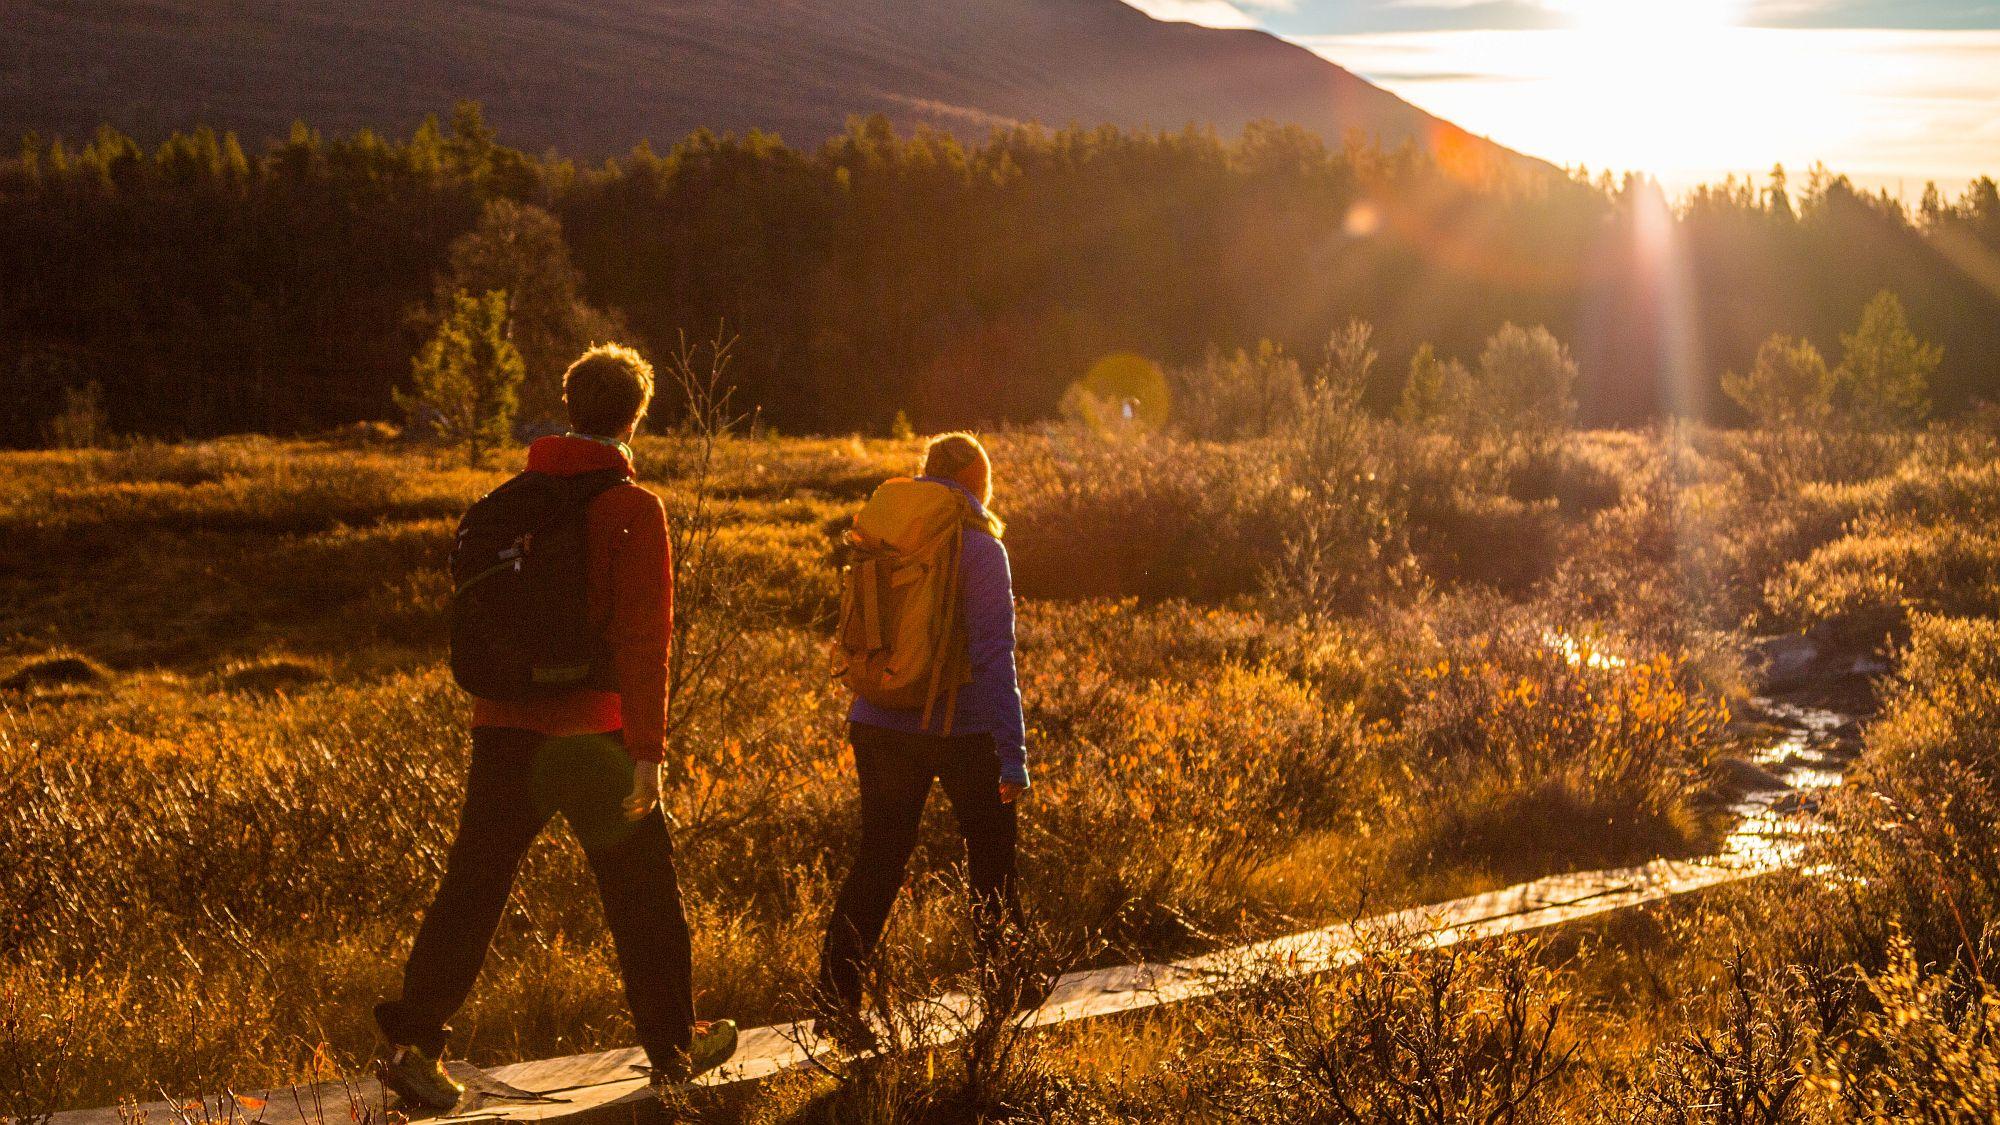 Wandern in der Herbstsonne